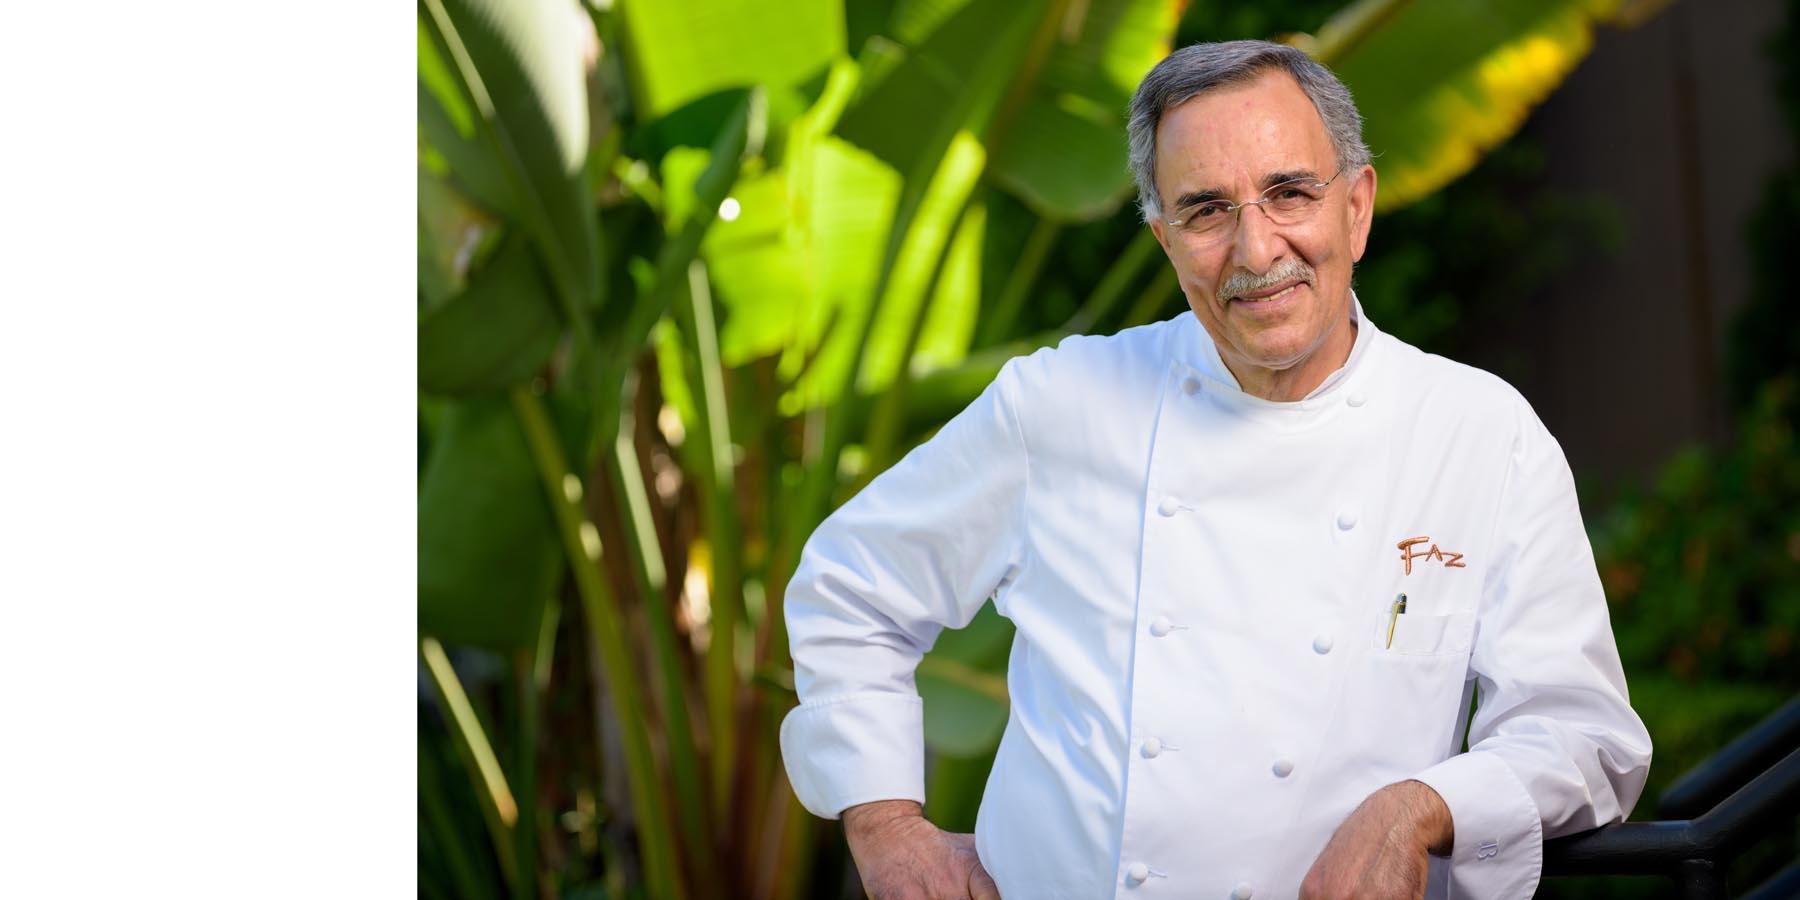 Portrait of Chef Faz outside